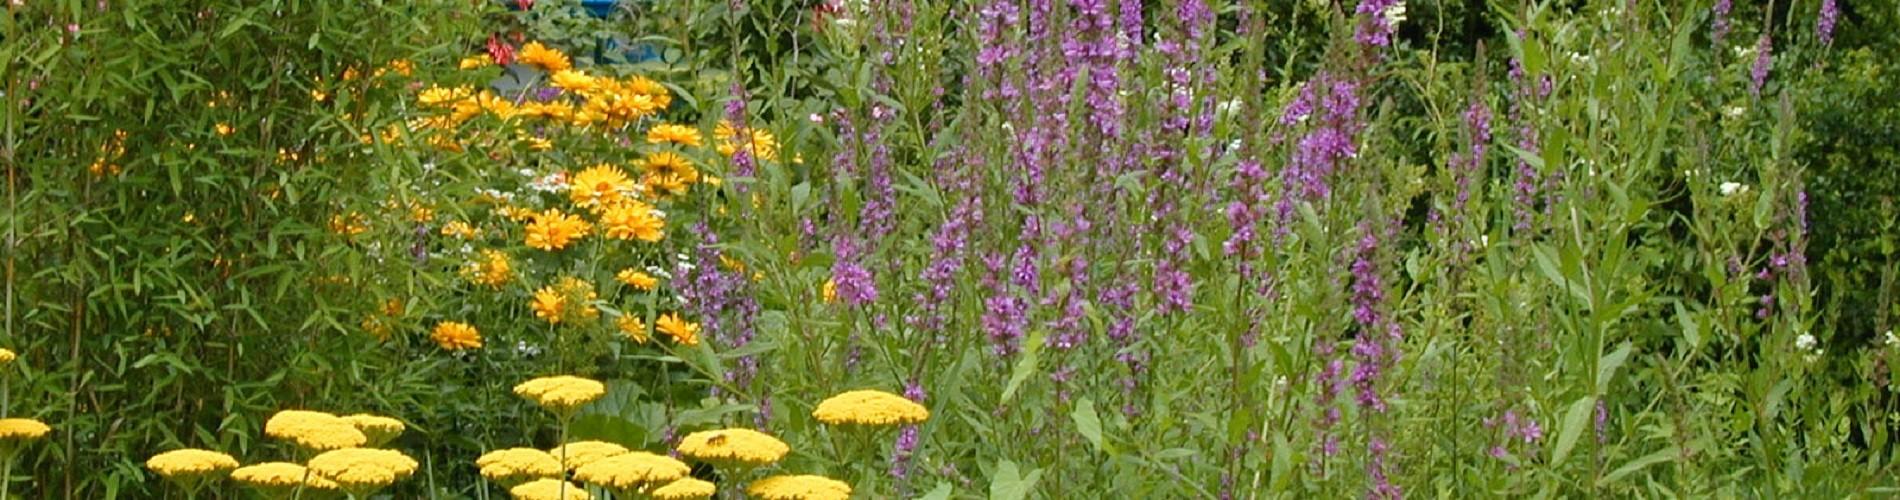 Blumen Garten Kreativ